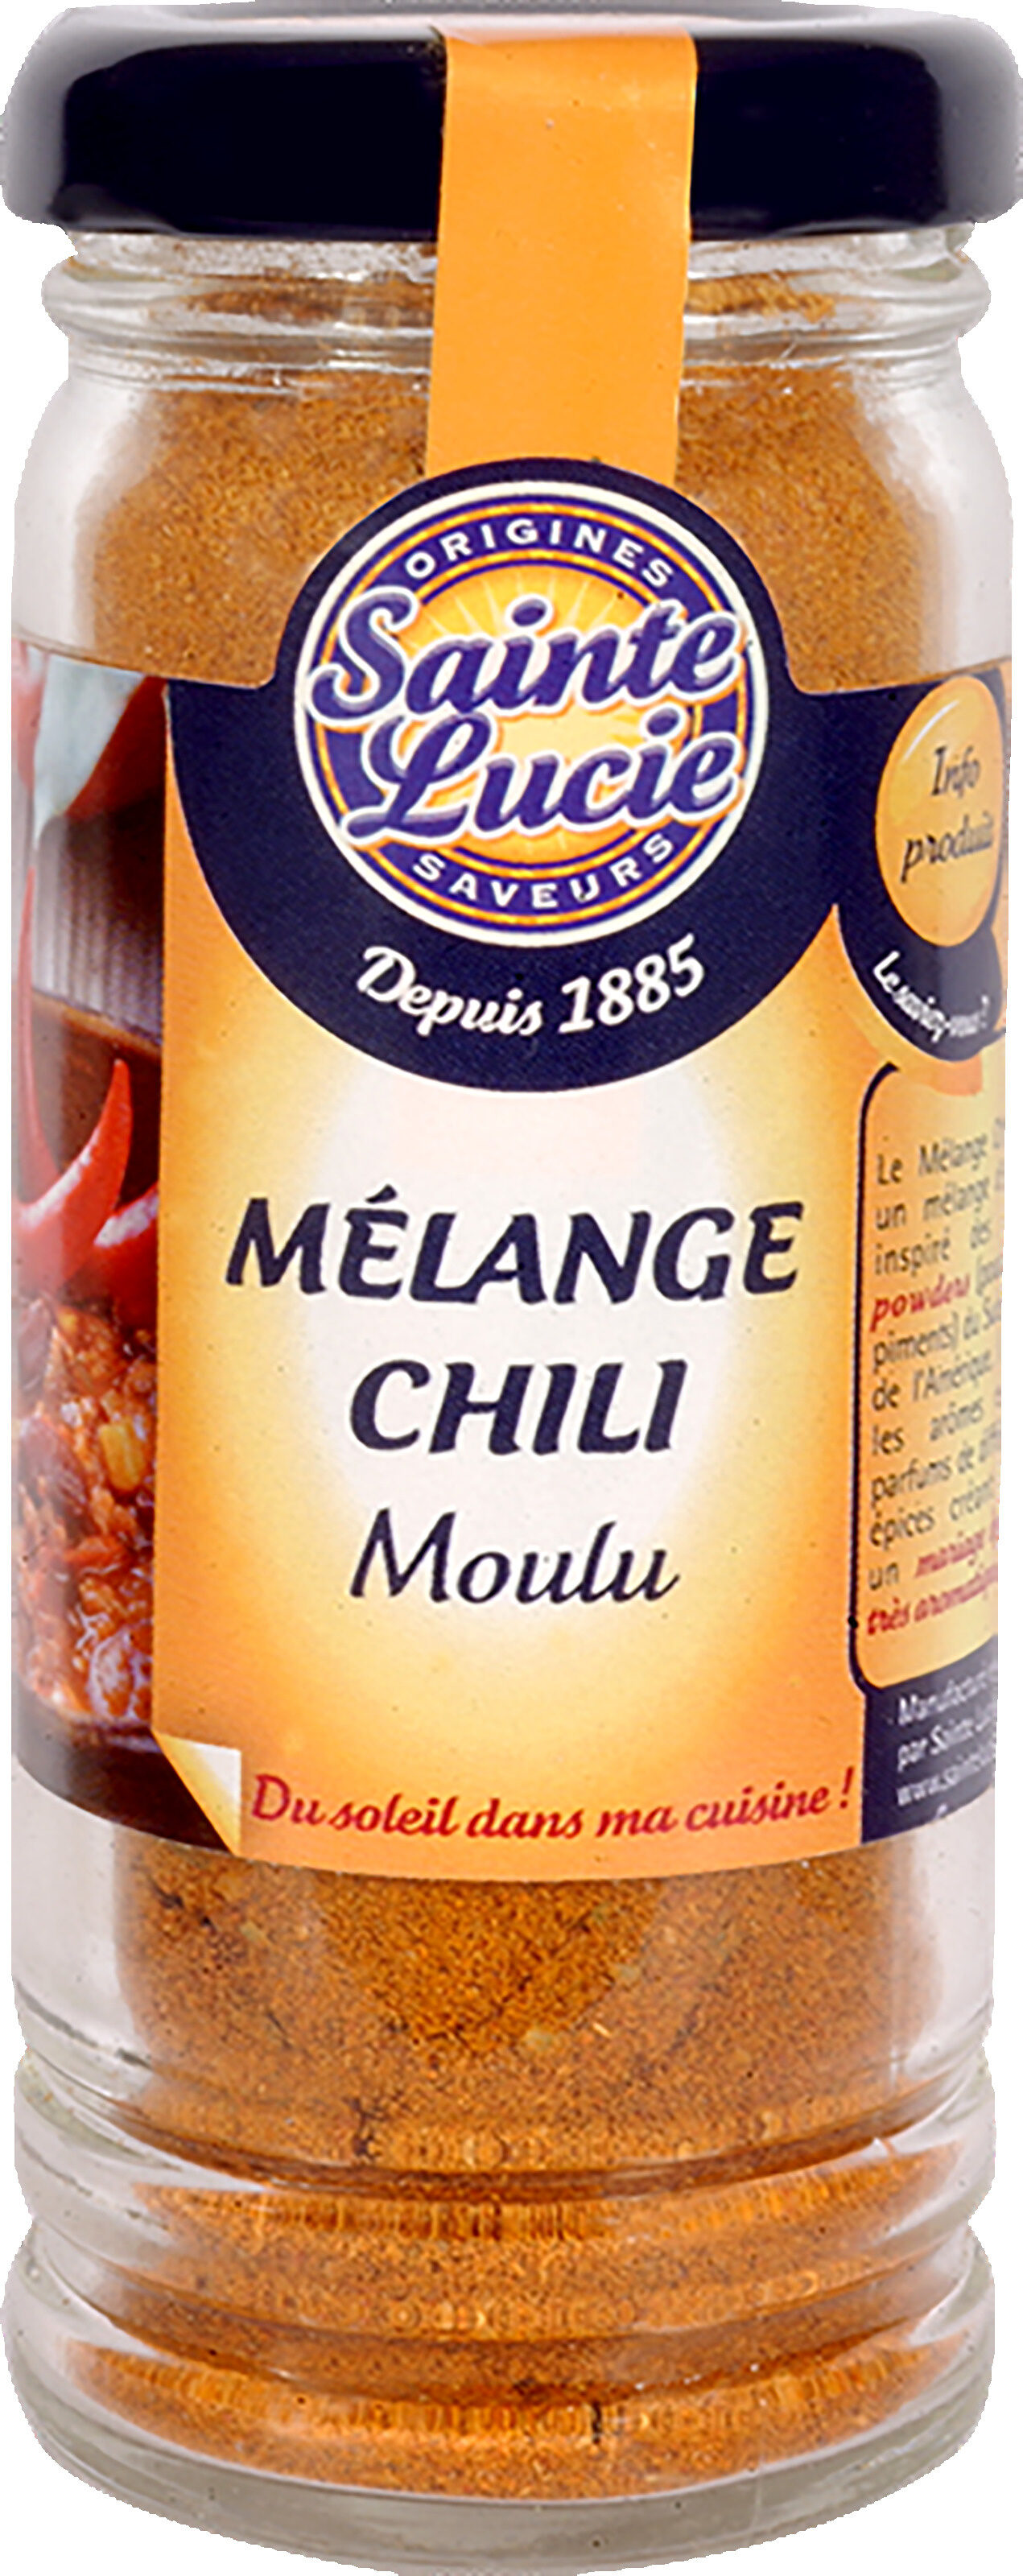 Mélange chili - Product